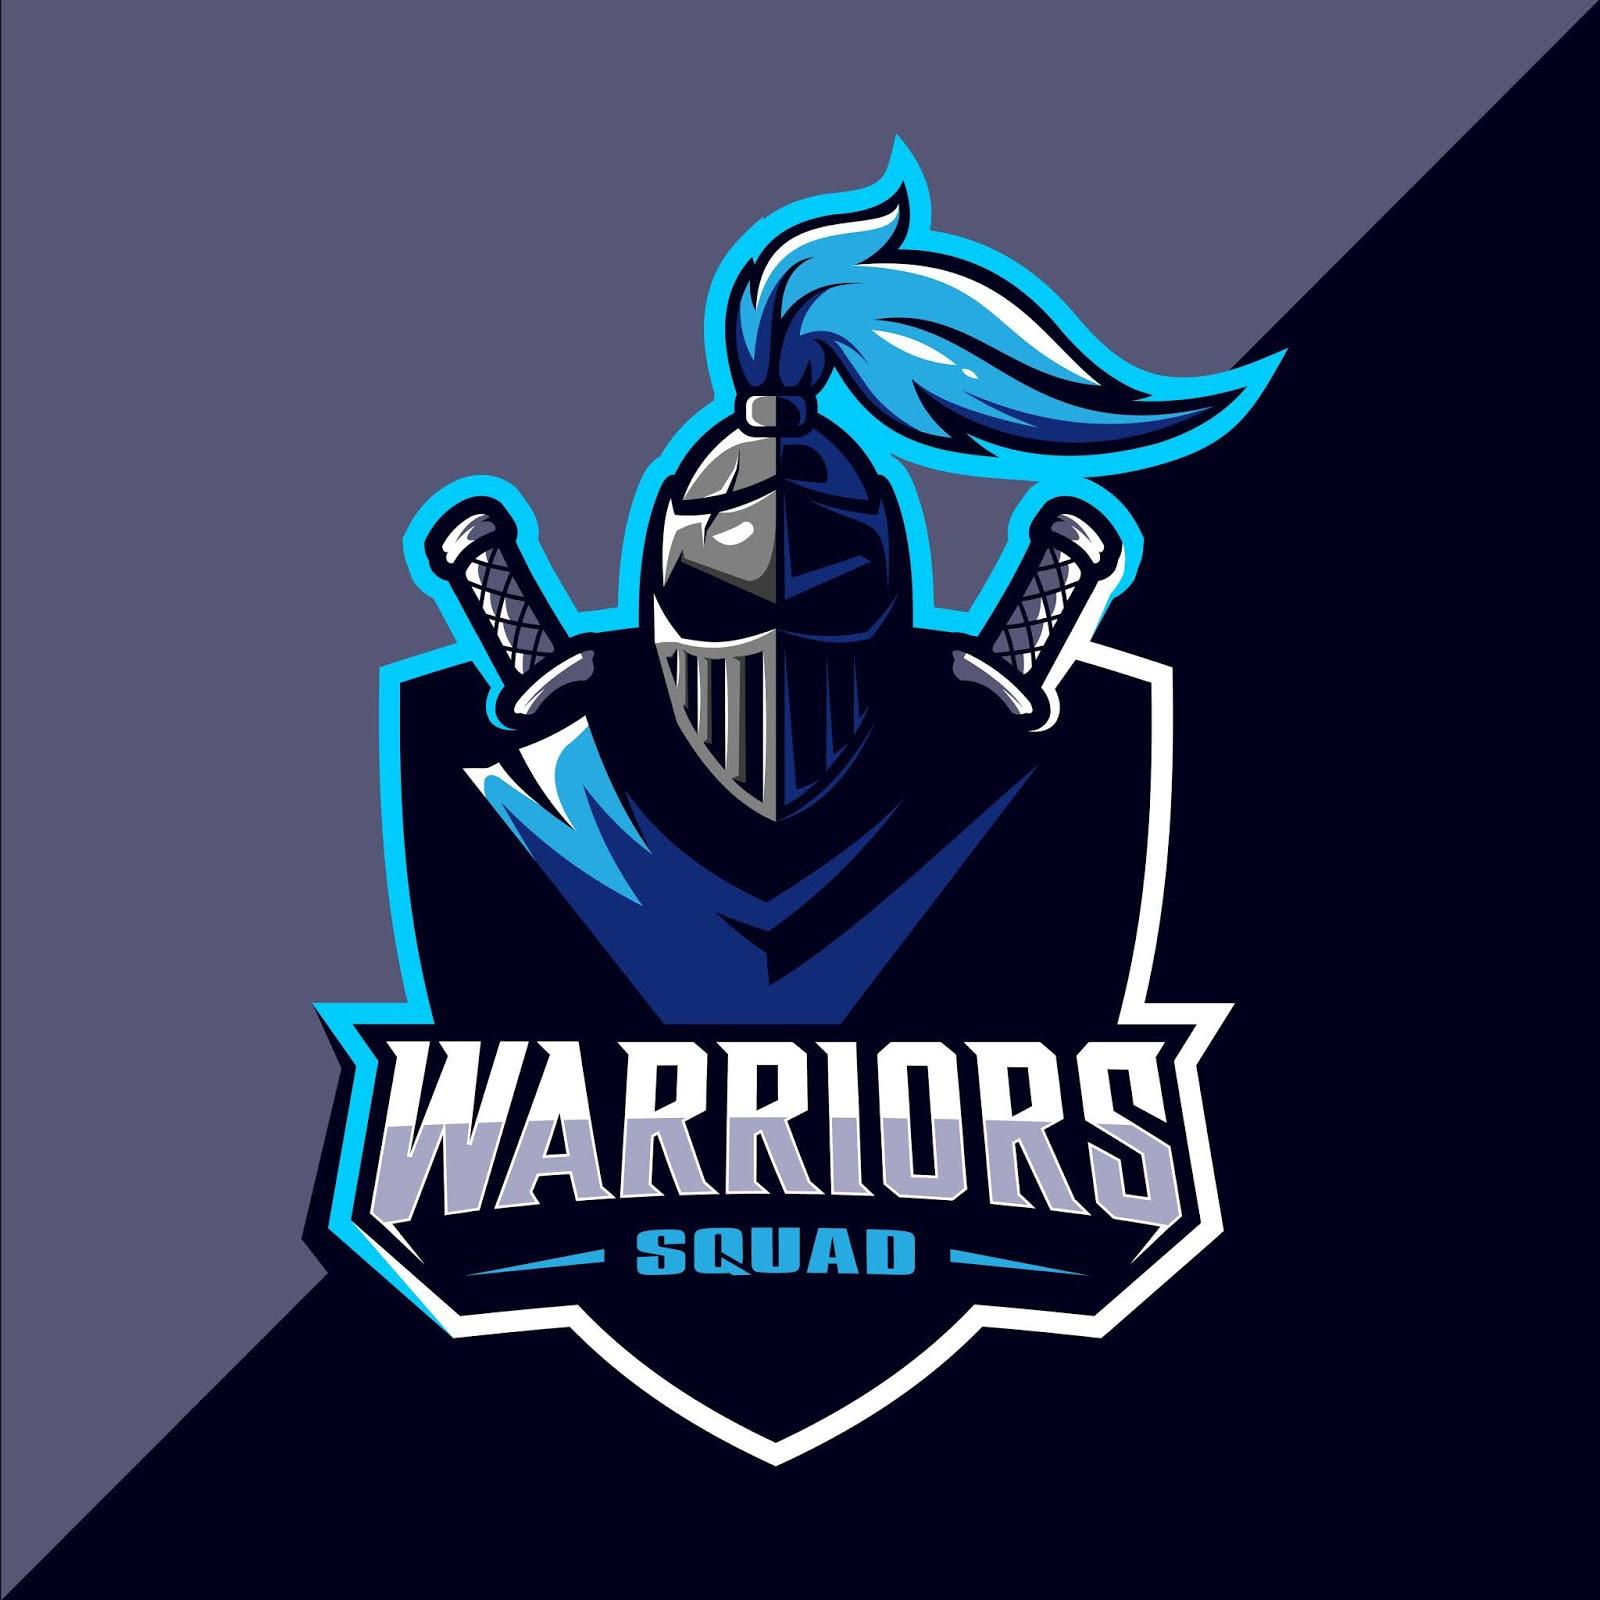 Warrior Esport Mascot Logo Design Free Download Vector CDR, AI, EPS and PNG Formats